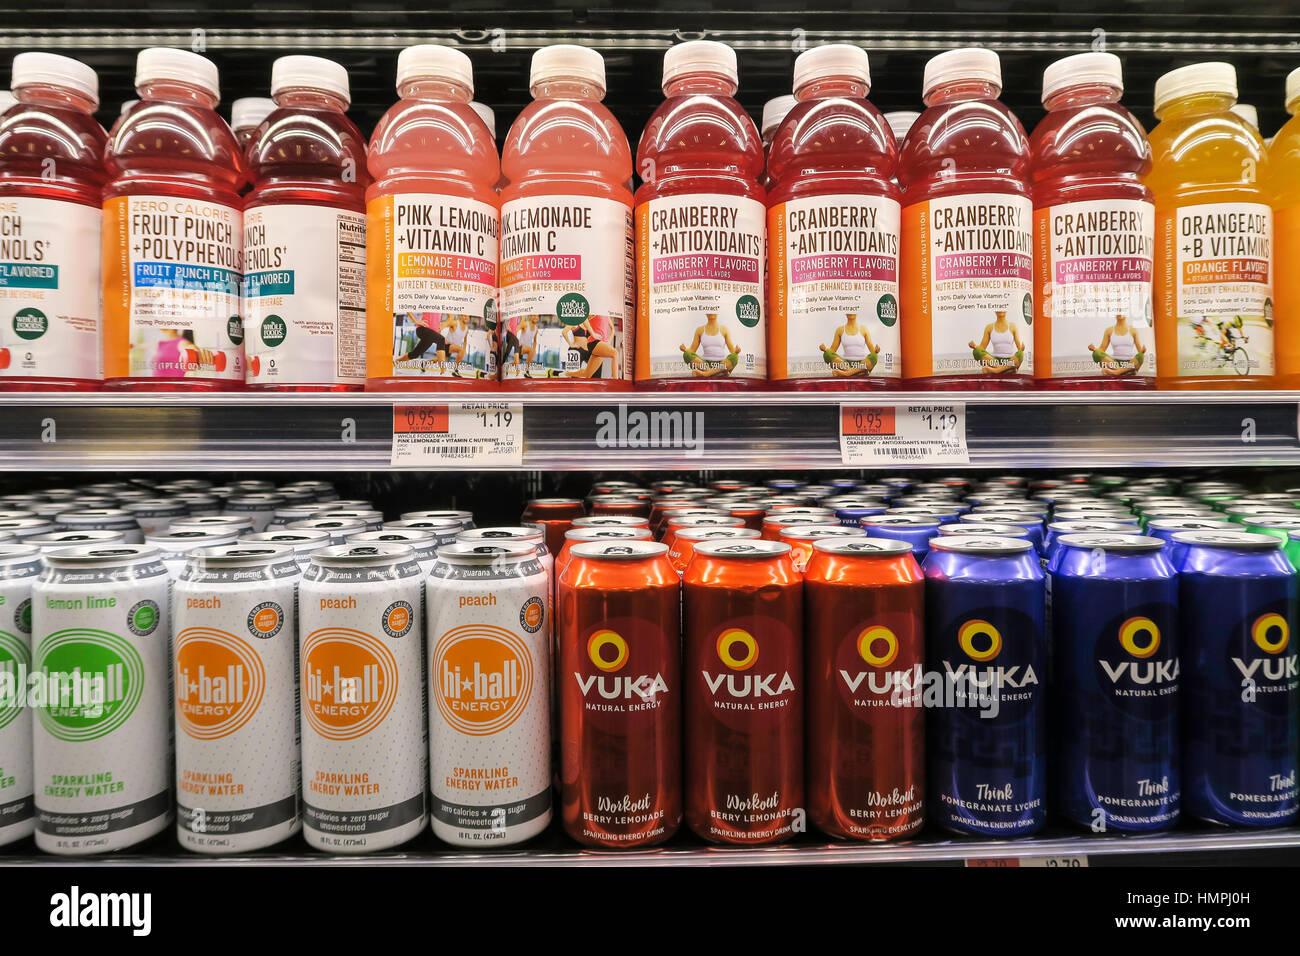 Whole Foods Market Bryant Park, NYC, USA - Stock Image